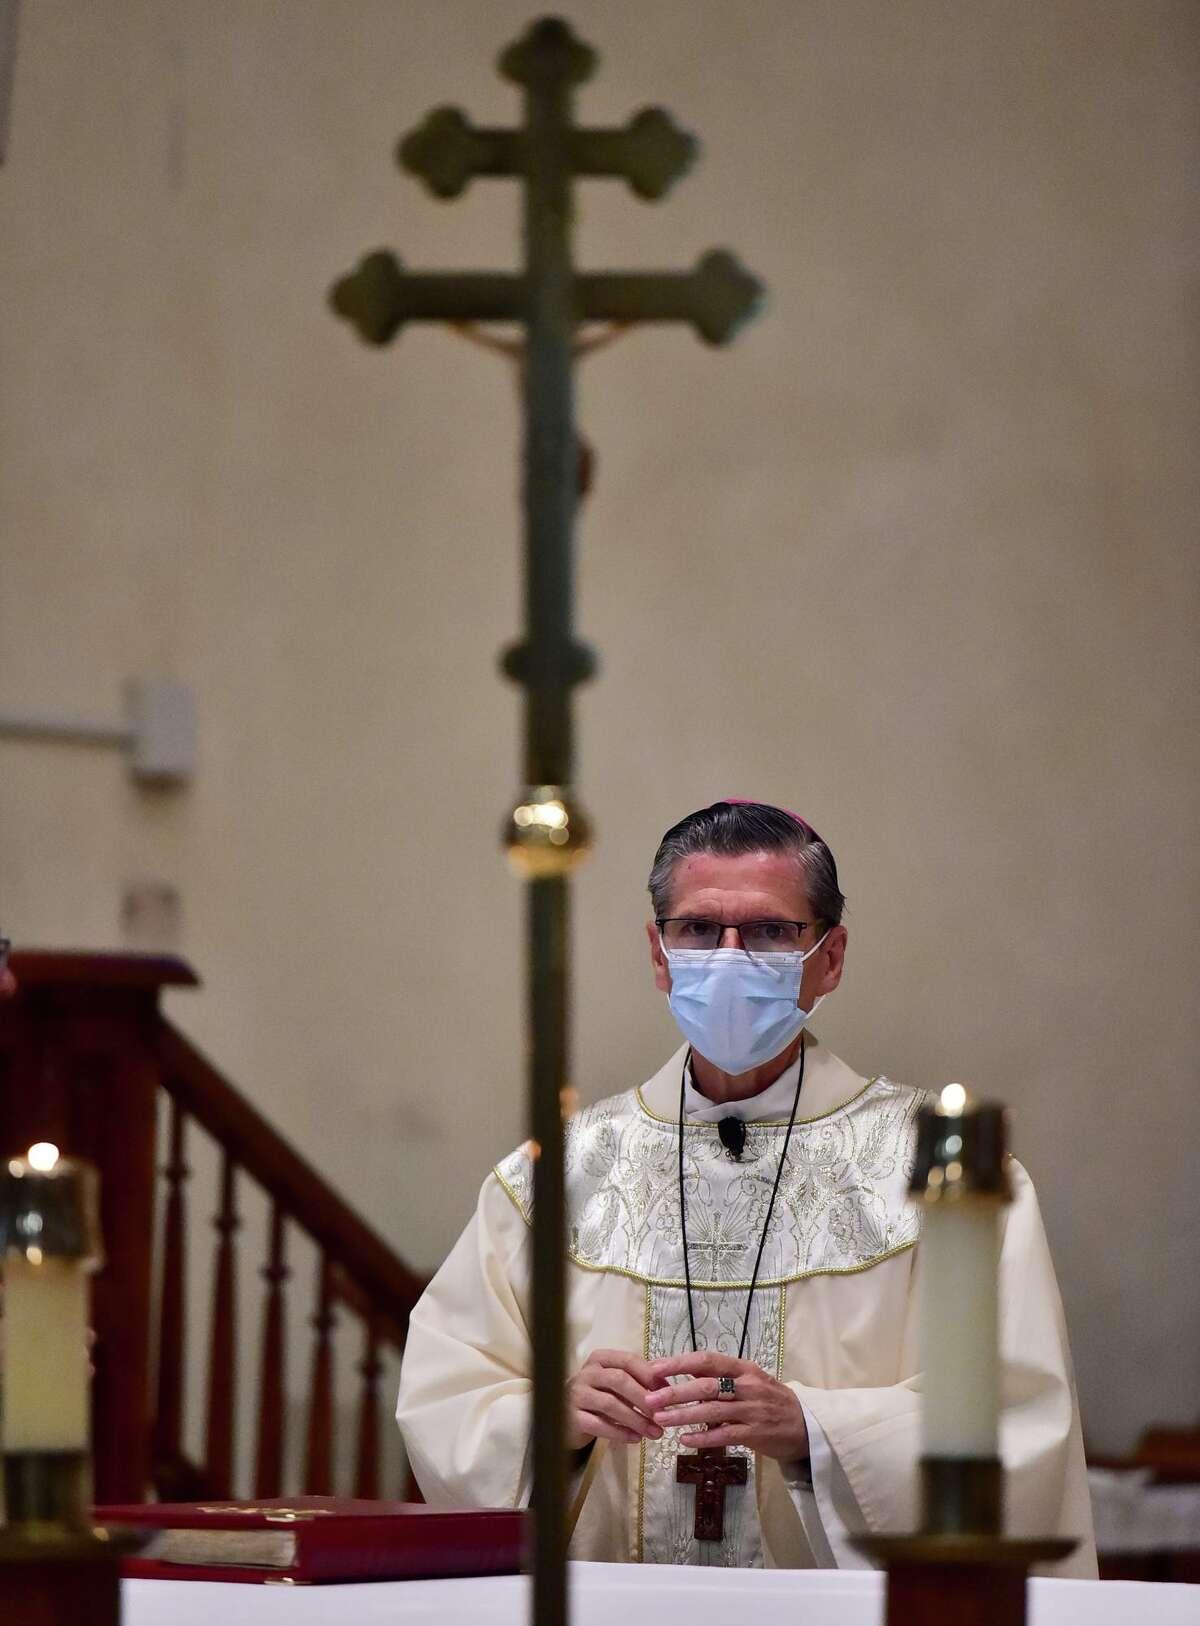 Archbishop Gustavo Garcia-Siller wears a mask during Sunday mass at San Fernando Cathedral.